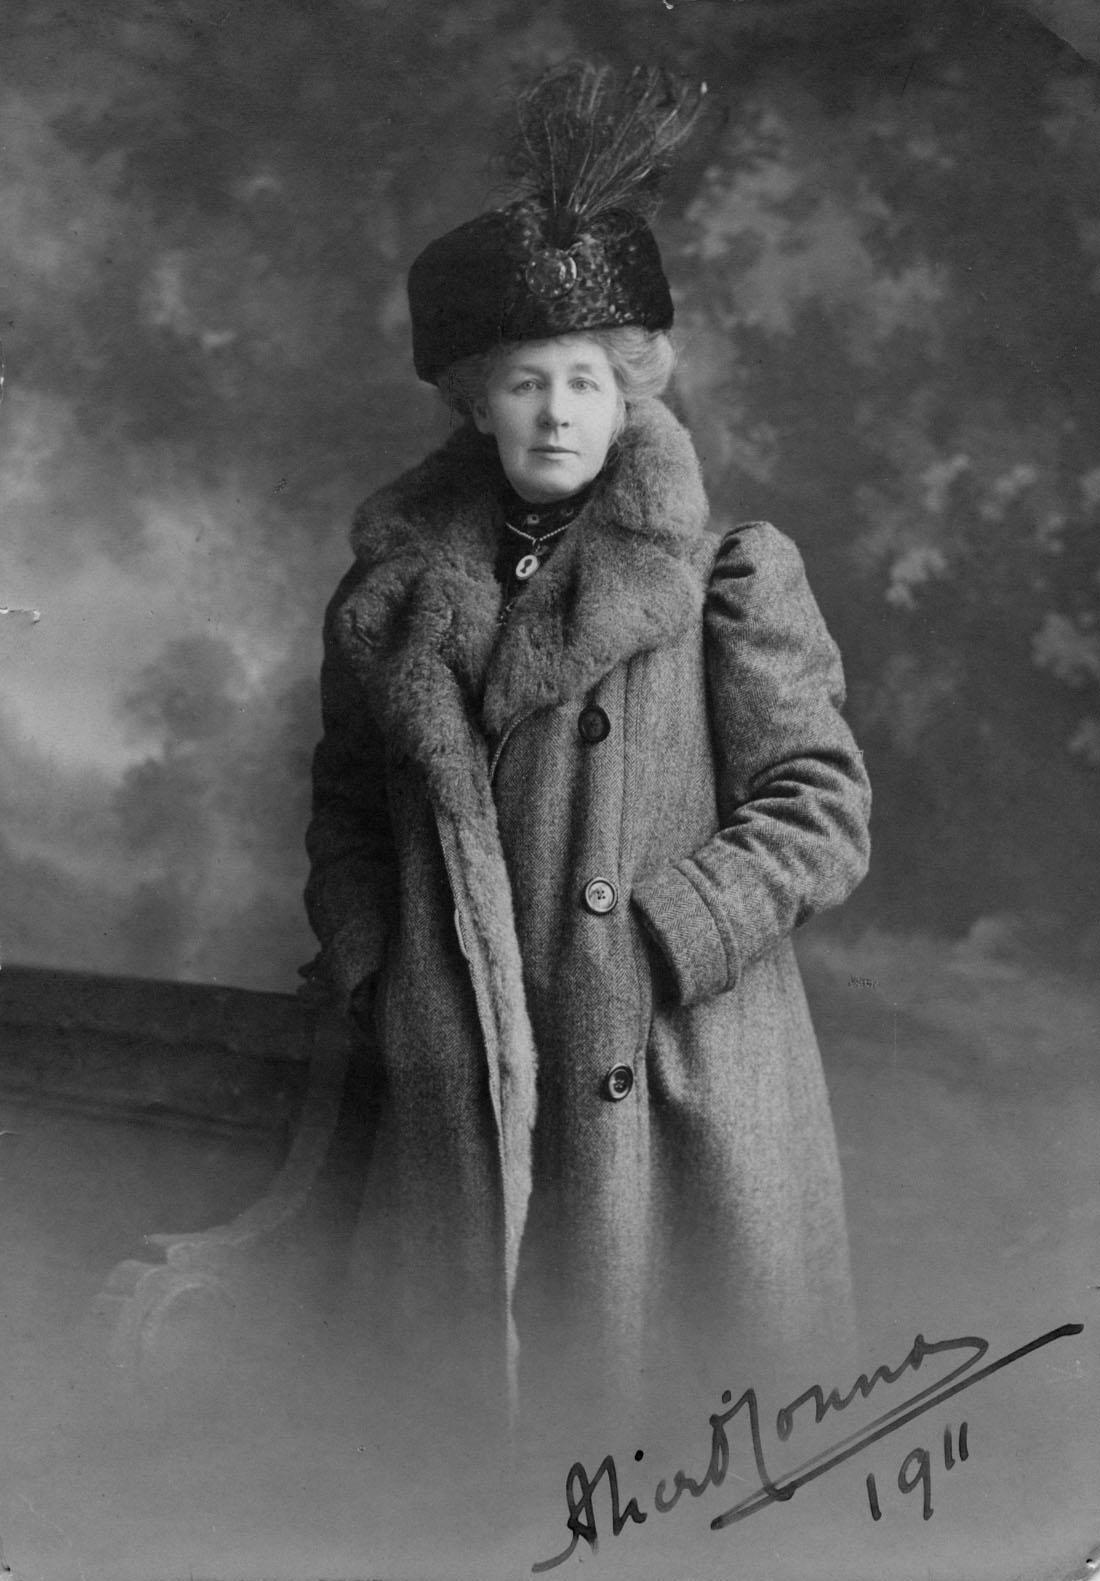 Margery Maude